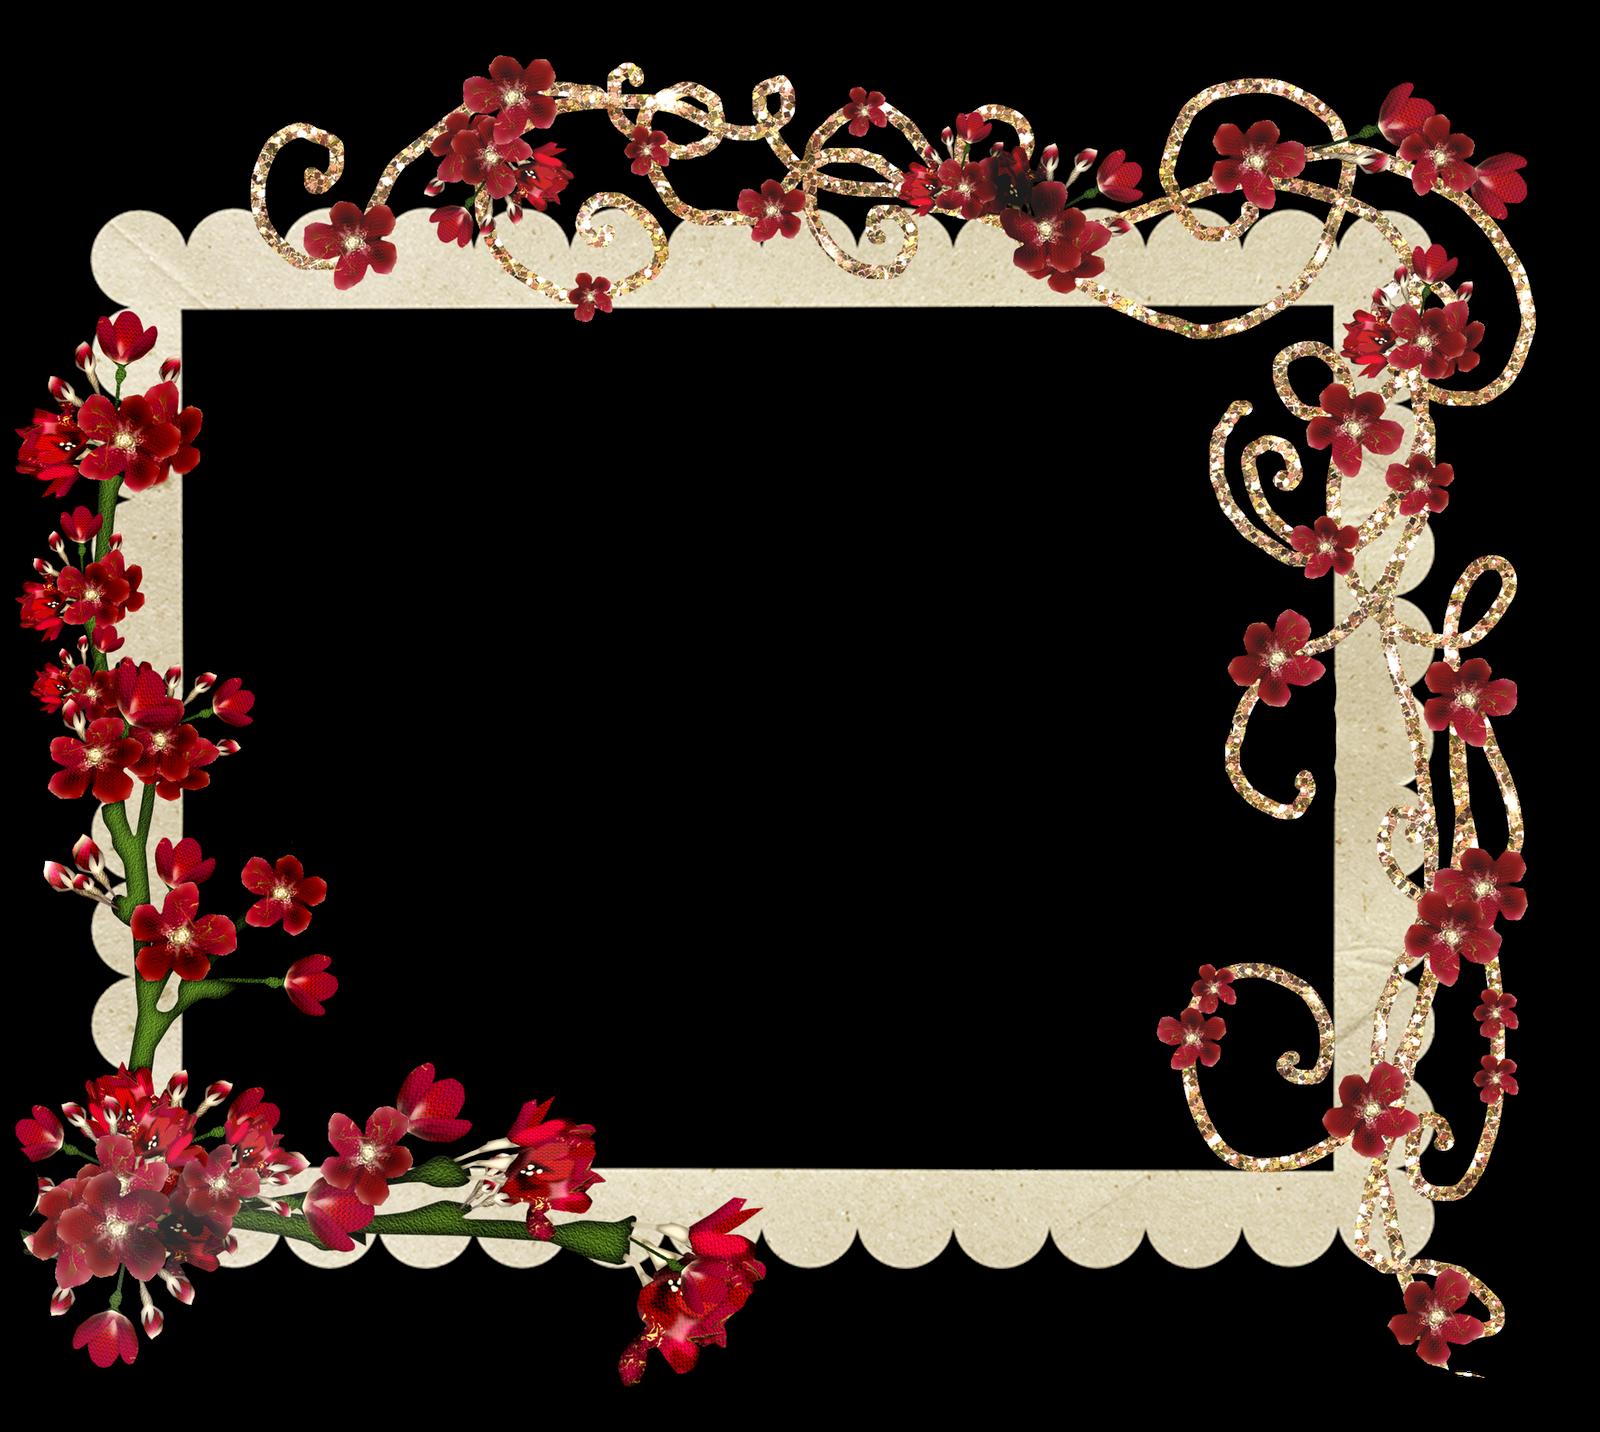 Marcos gratis para fotos marcos para fotos png florales - Marcos de fotos de pared ...